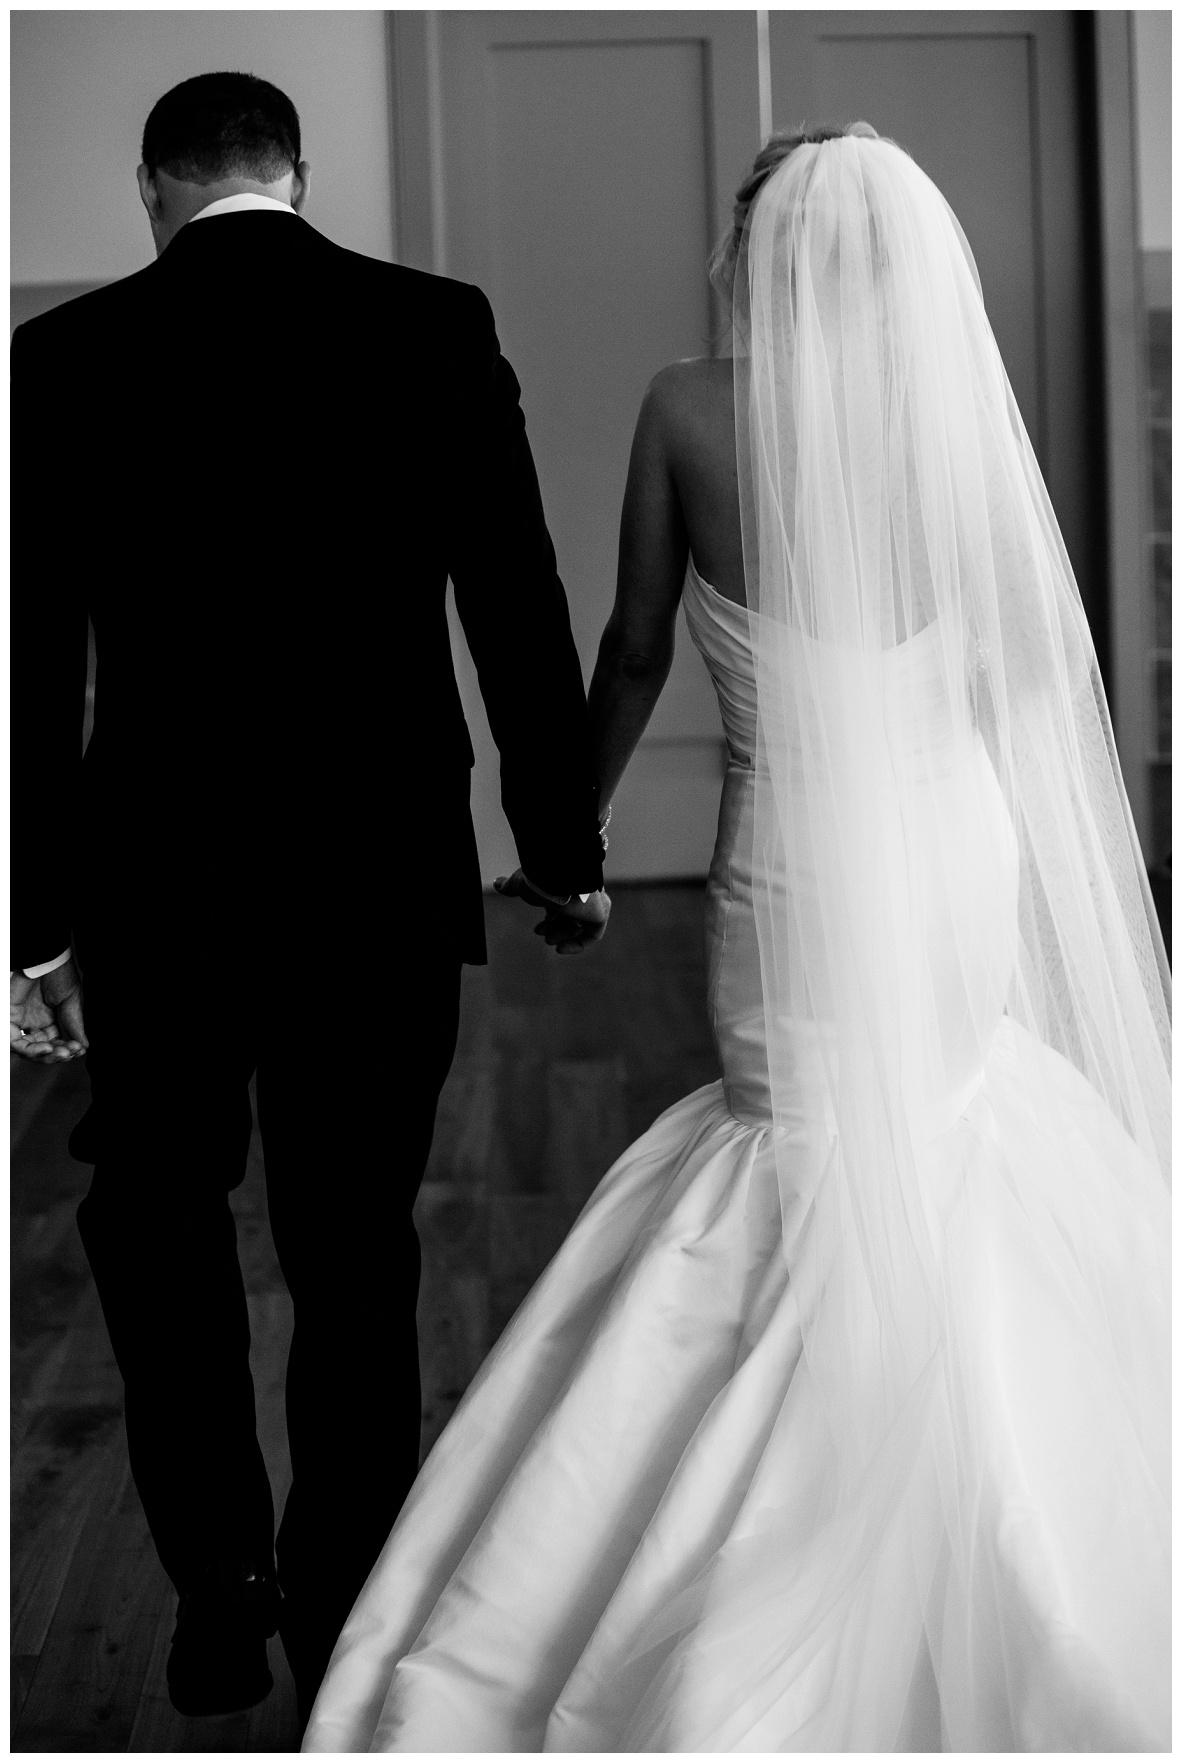 Mr. and Mrs. Papp_0022.jpg